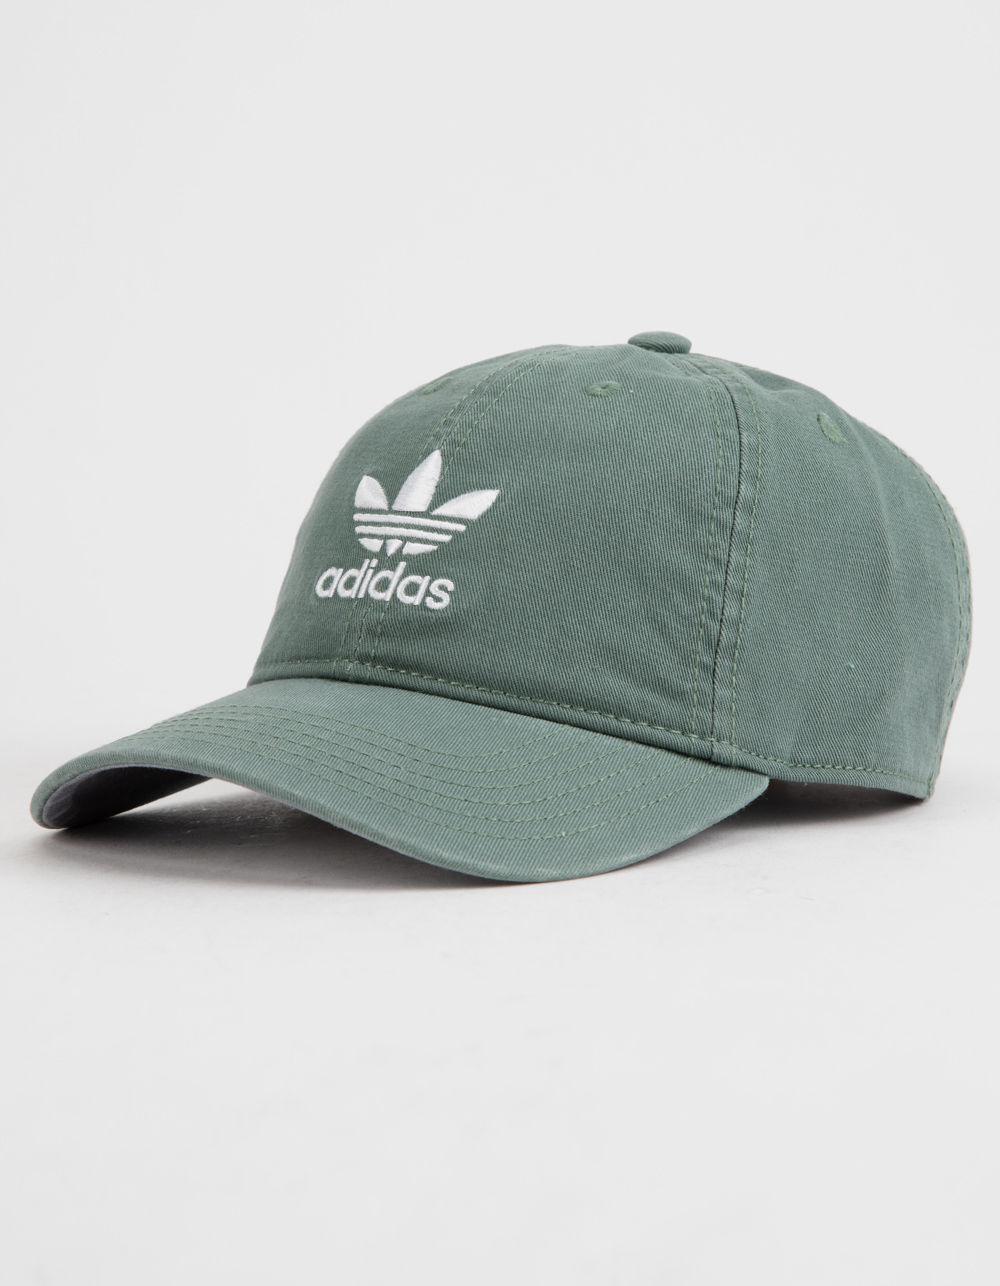 Adidas - Originals Relaxed Green Womens Strapback Hat - Lyst. View  fullscreen 28f447d017b